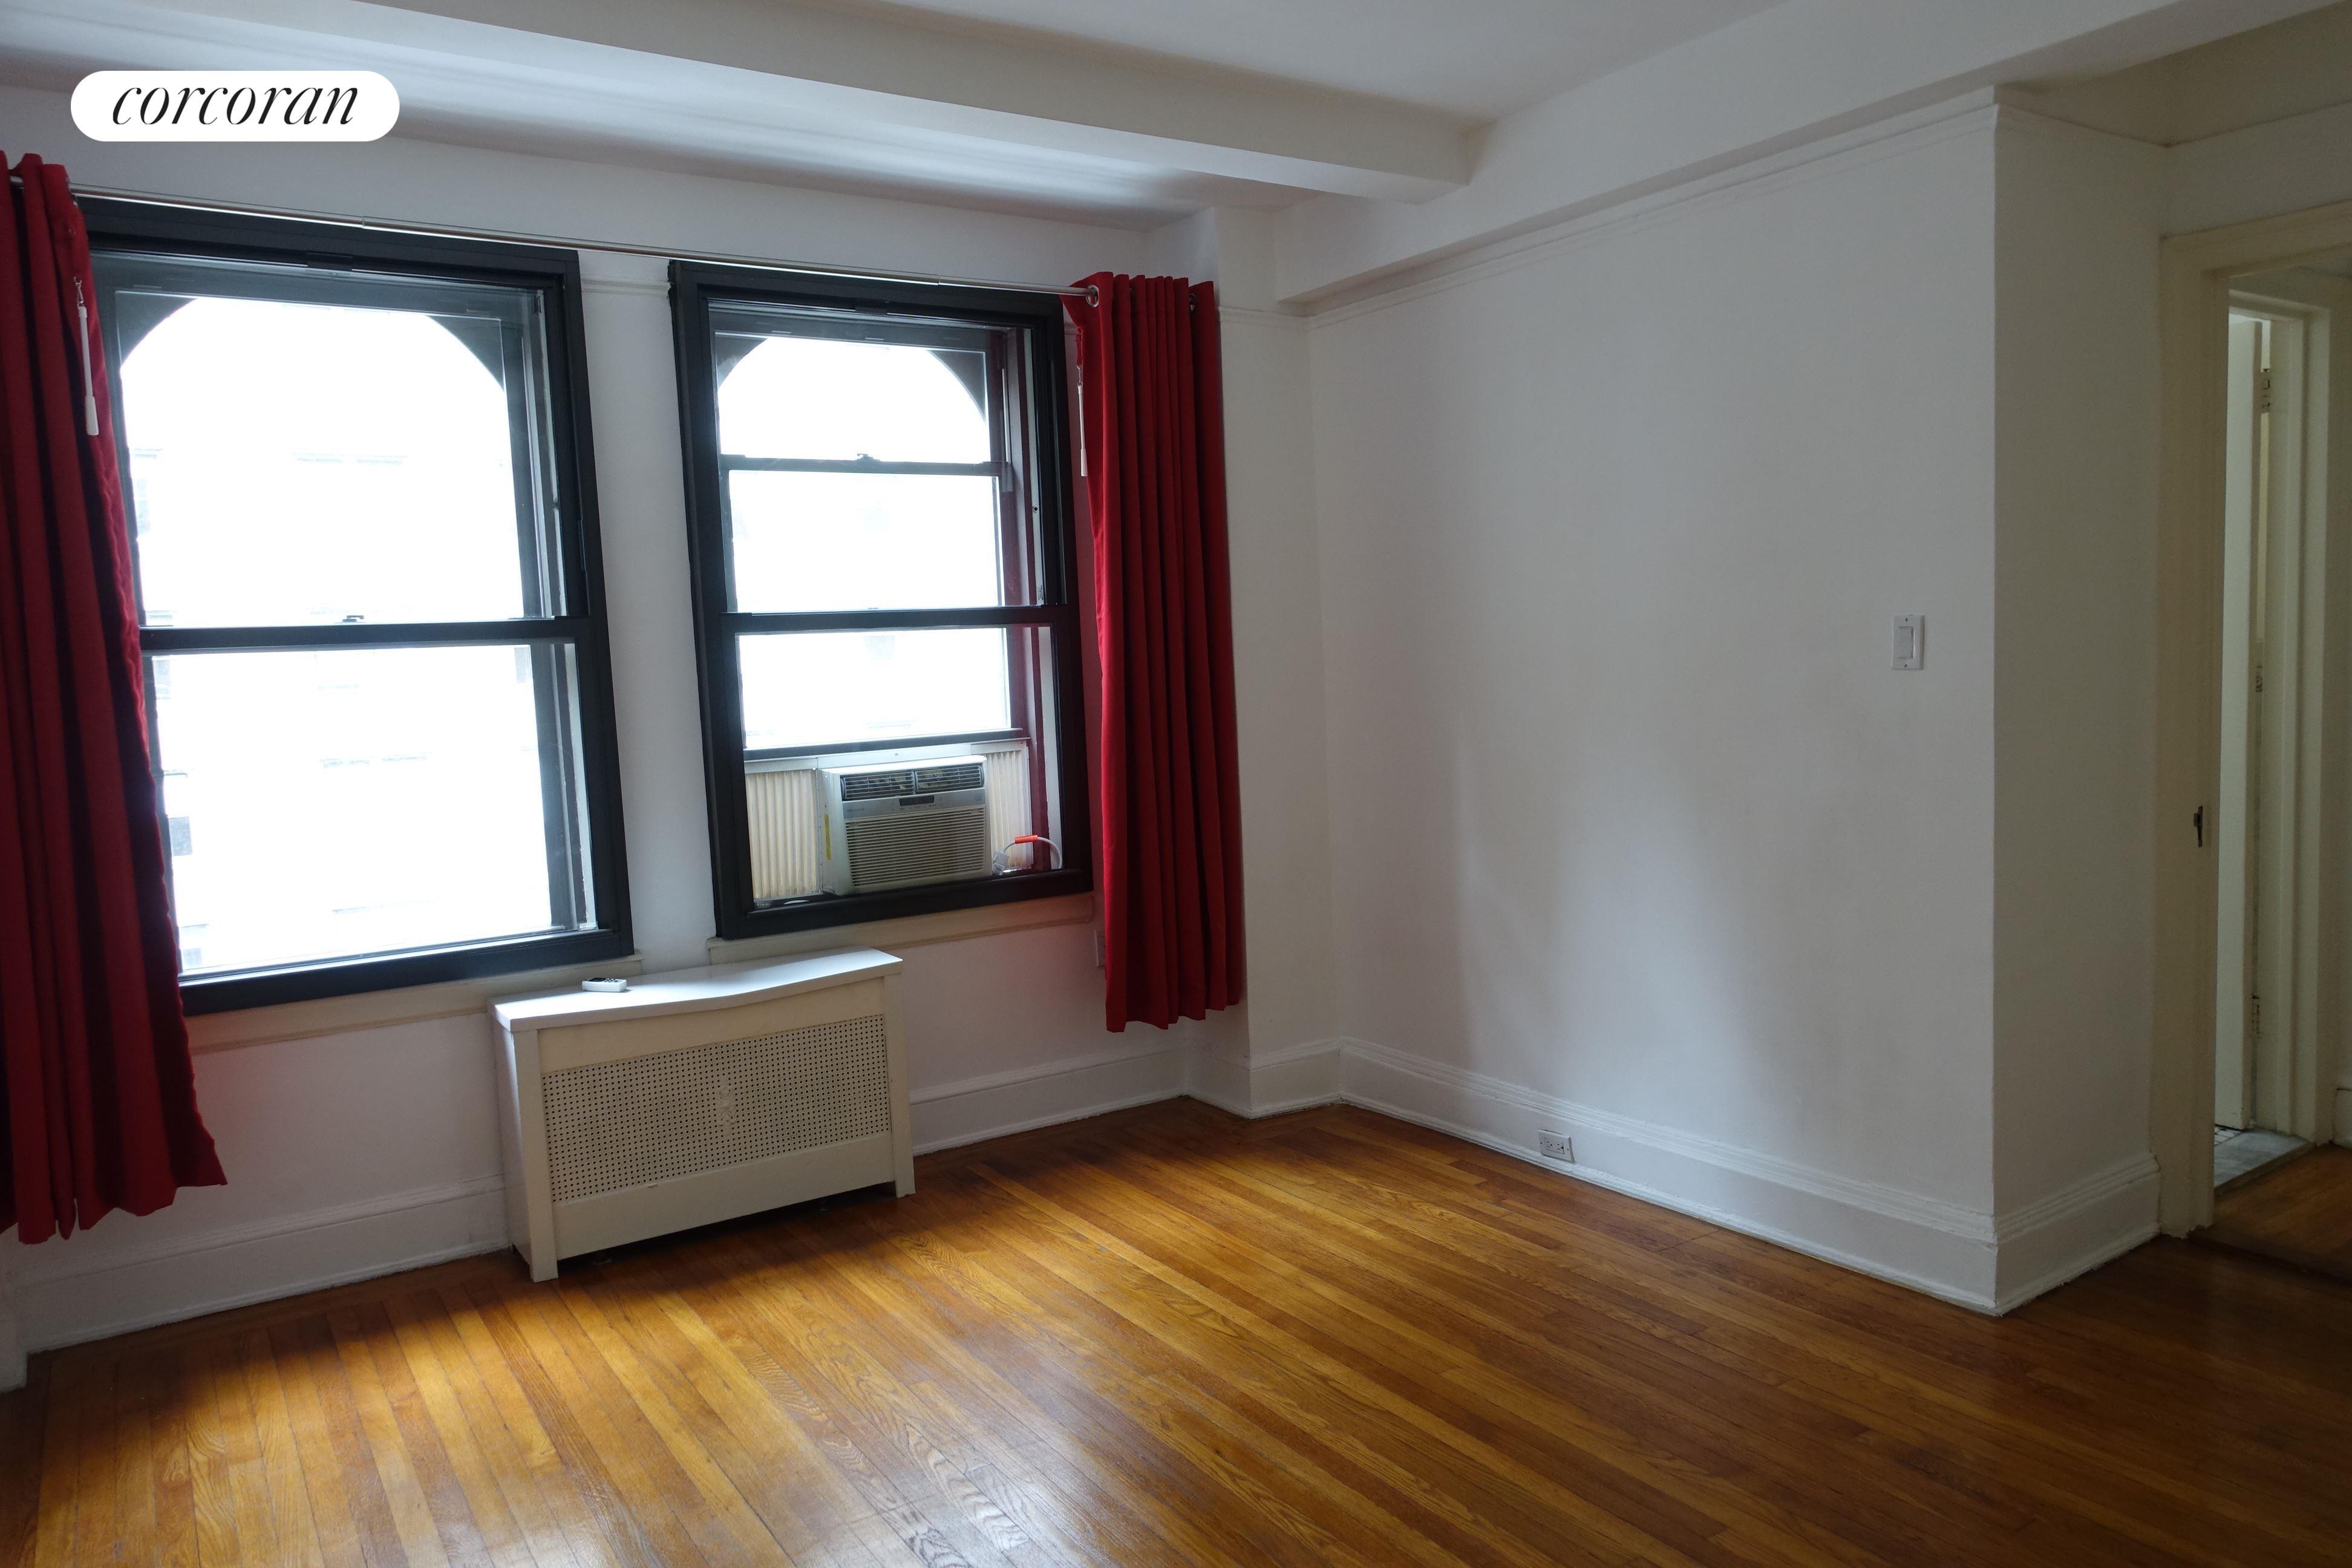 Corcoran 162 West 56th Street Apt 1506 Midtown West